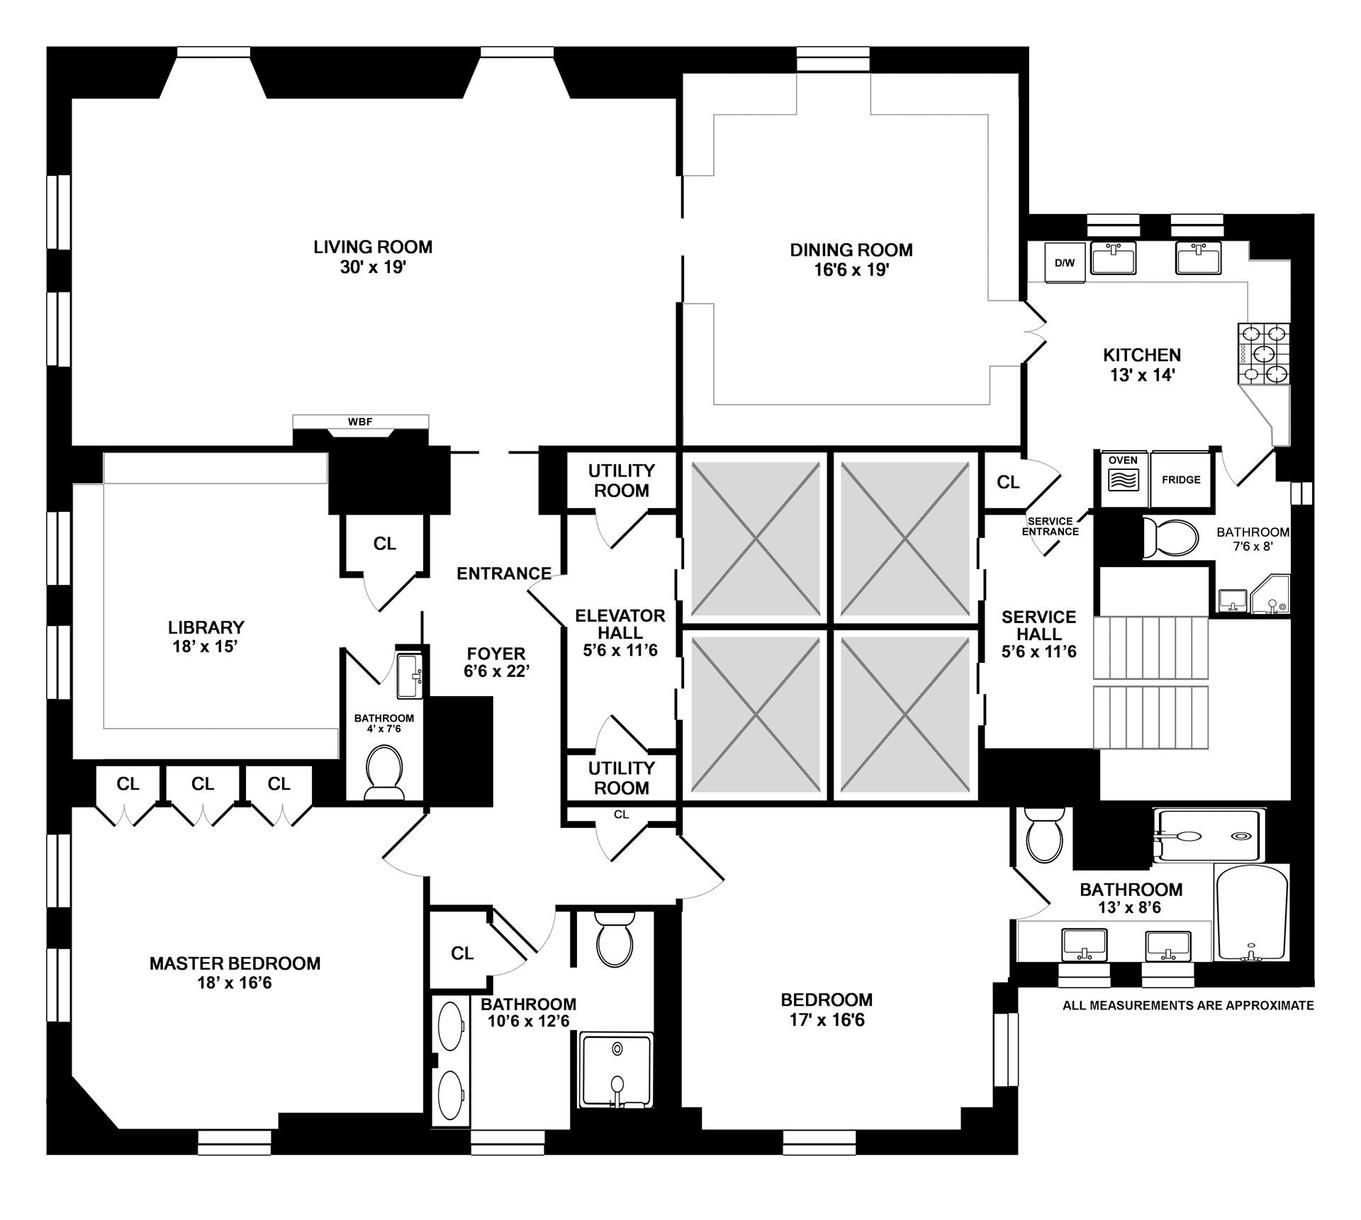 Manhattan Apartments for Sale - Luxury Apartment Listings ...